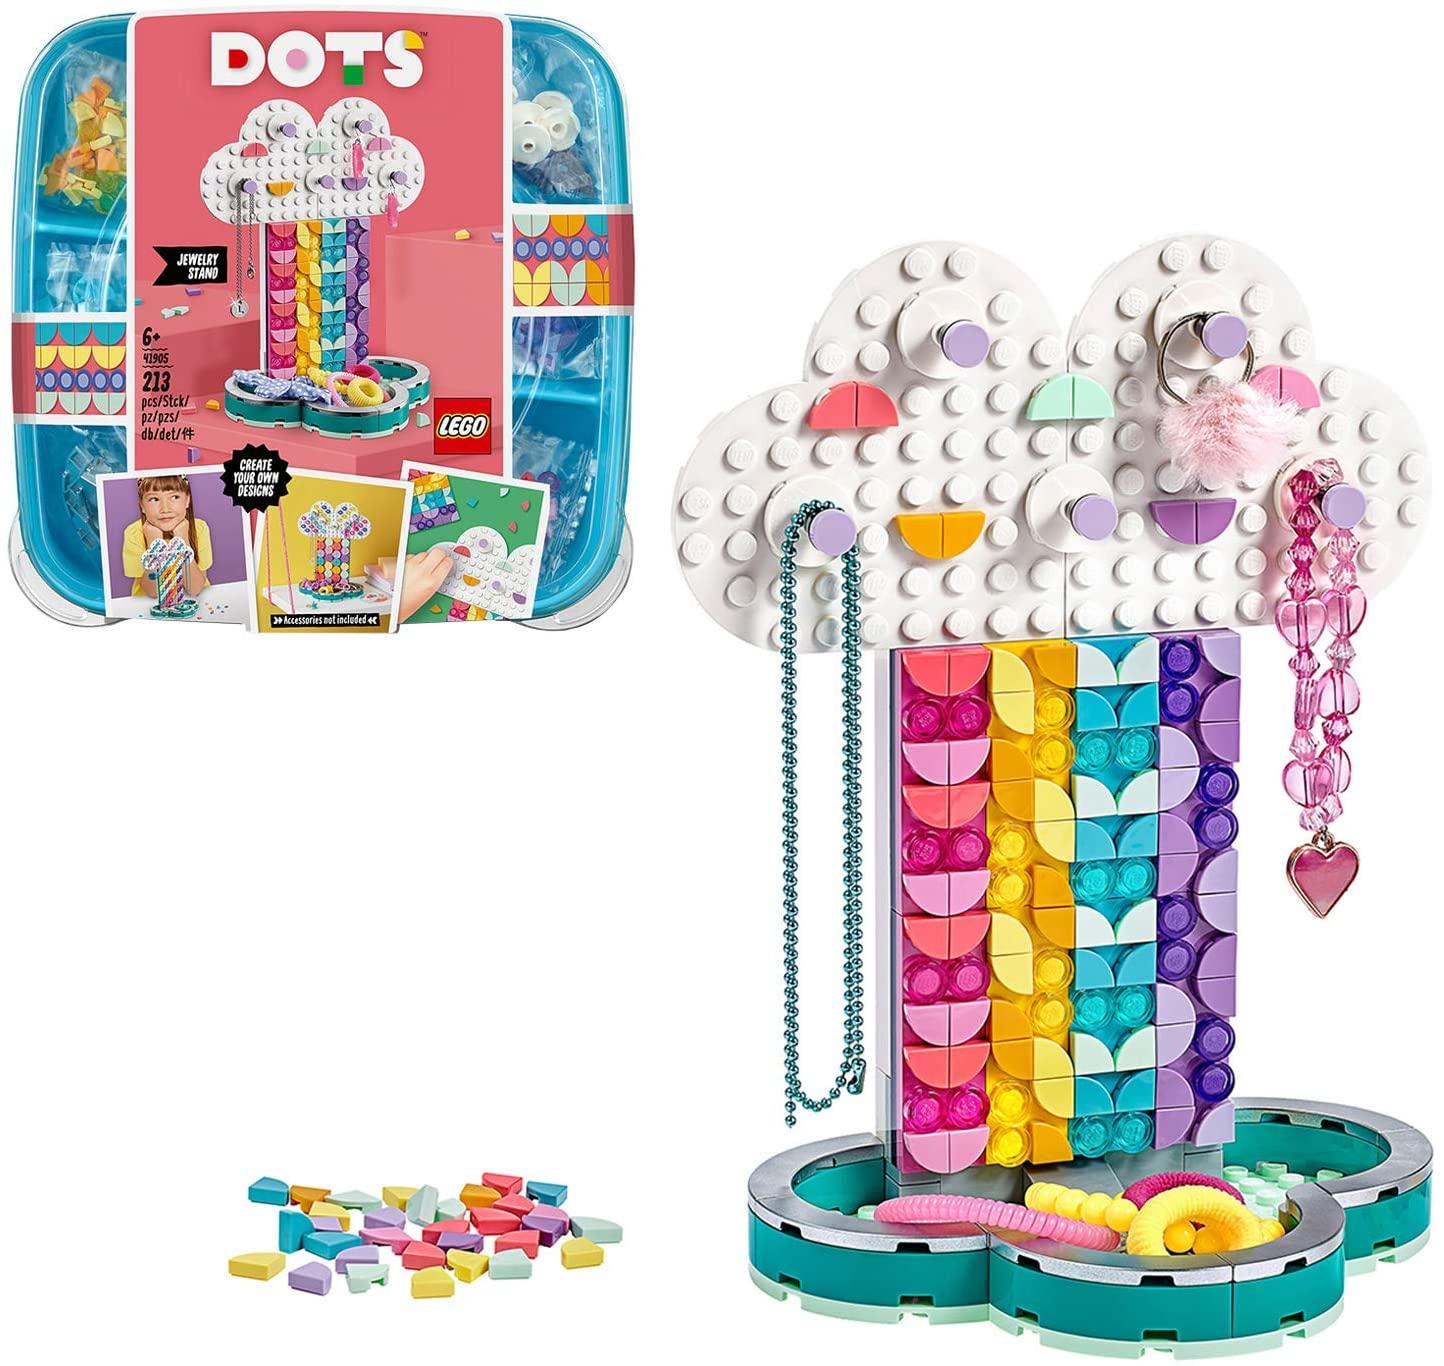 LEGO 41905 DOTS Rainbow Jewellery Stand DIY Desk Accessories Decorations Set for £7.98 (Prime) / £12.47 (Non Prime) delivered @ Amazon